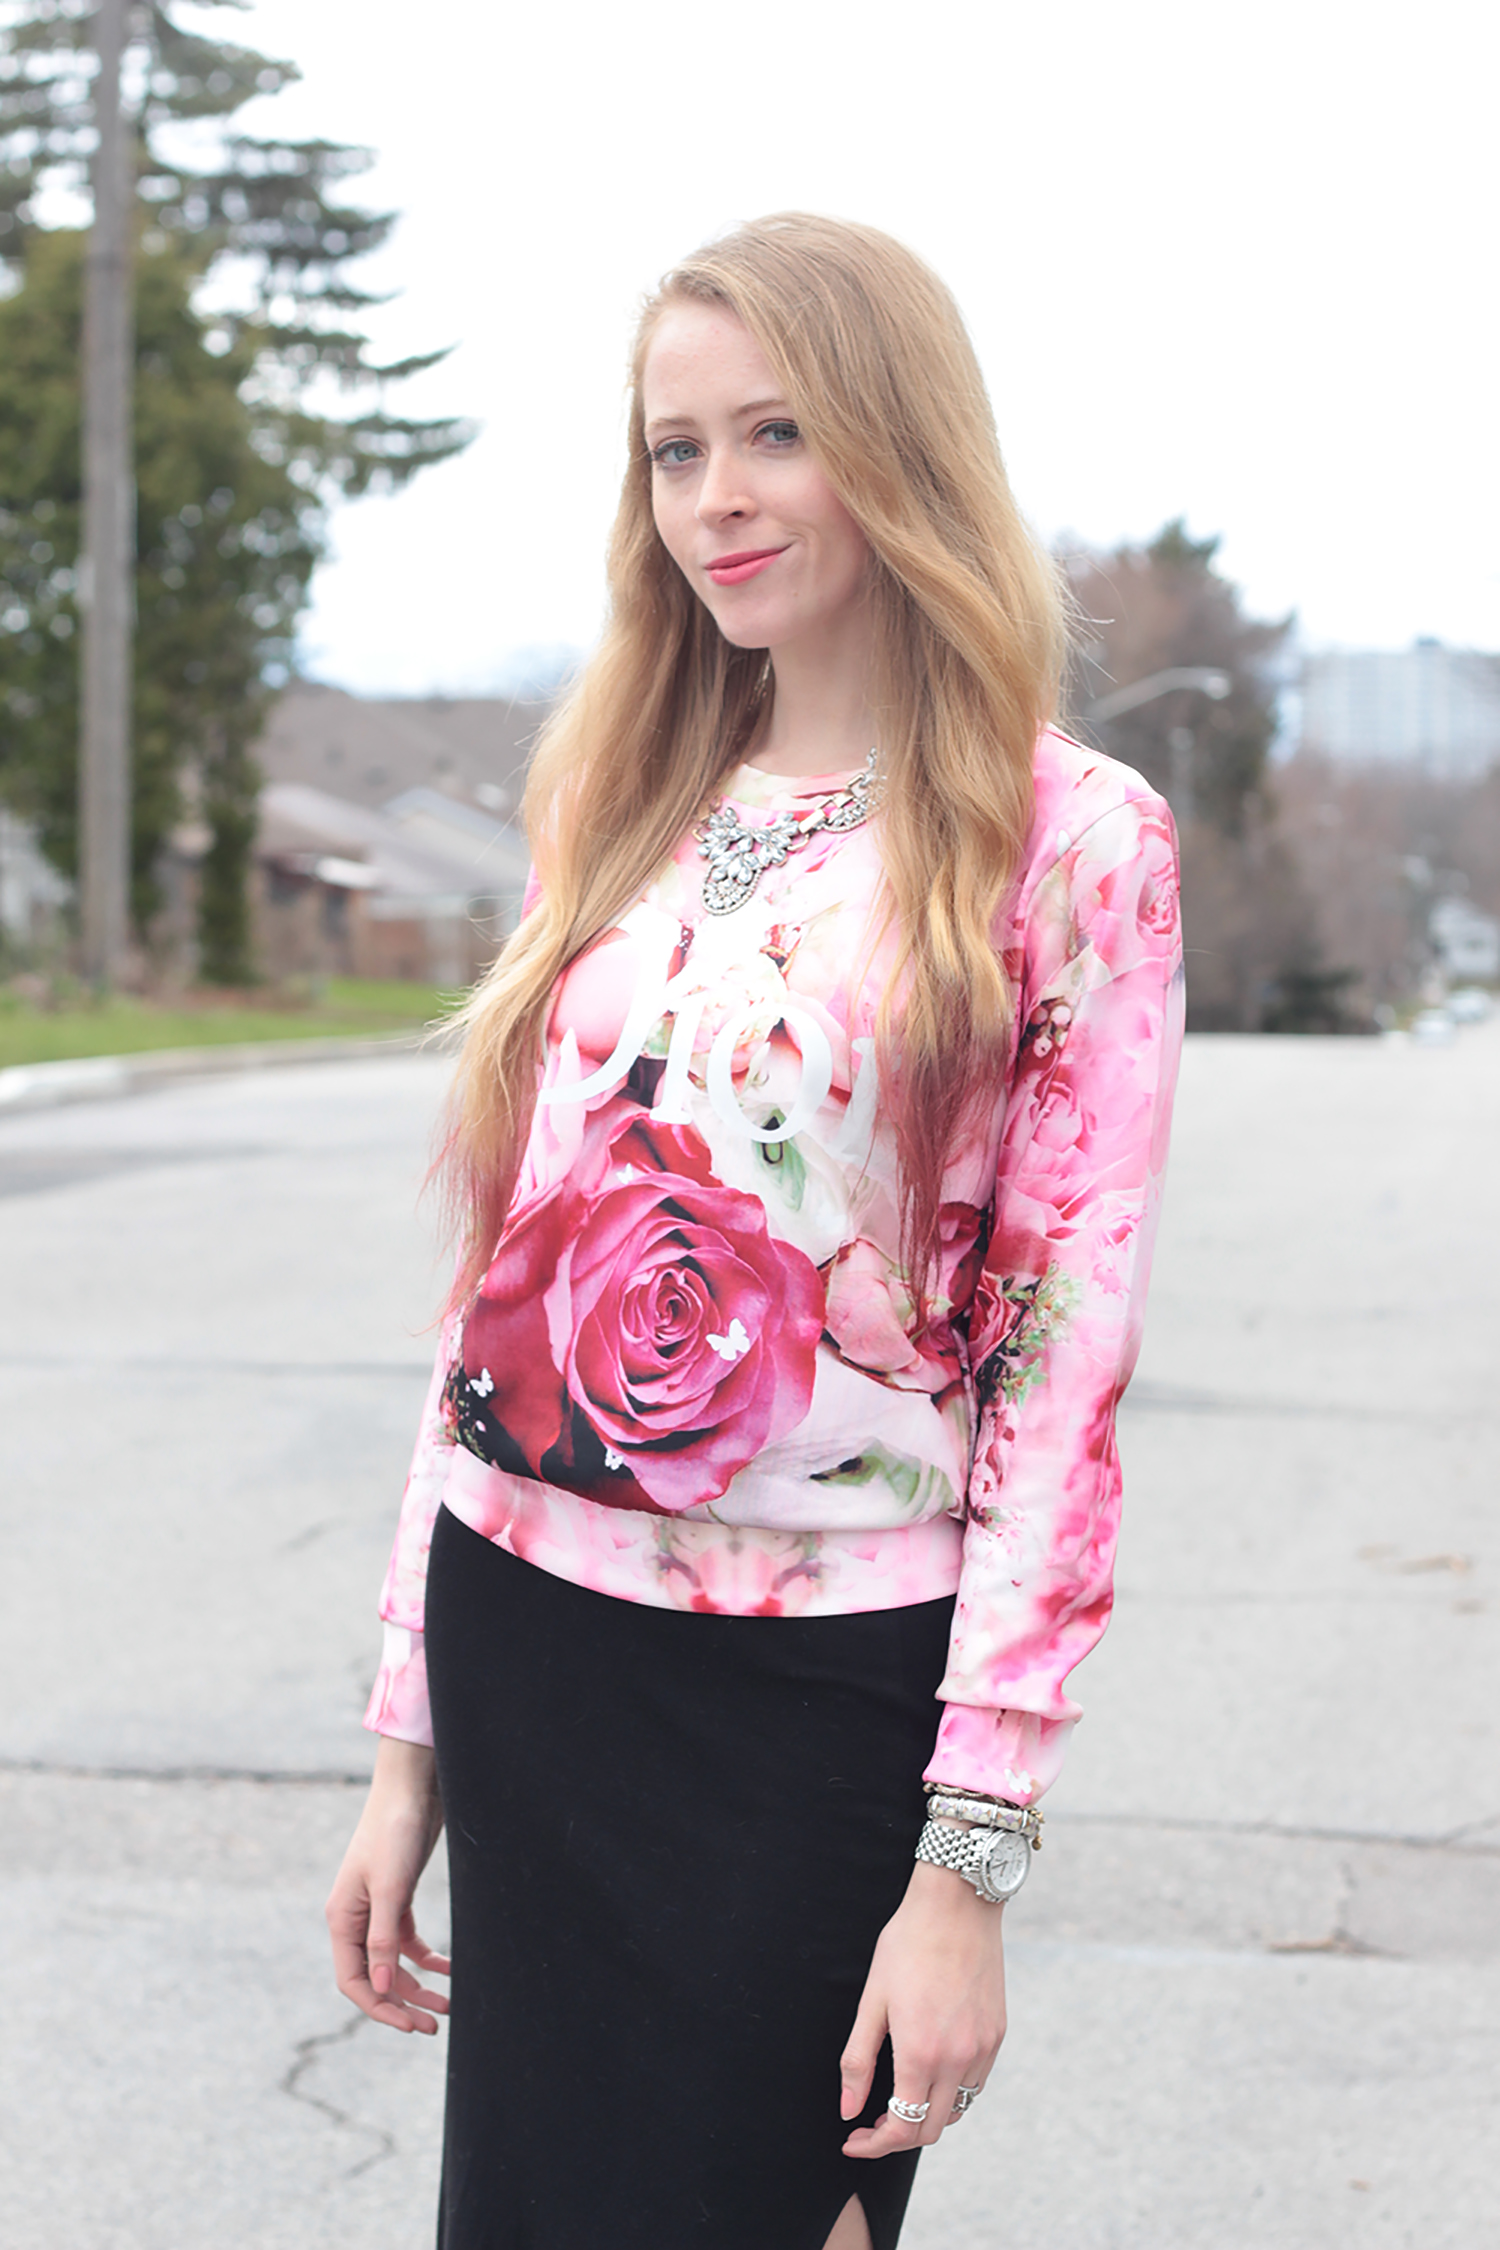 dior rose sweatshirt sheinside